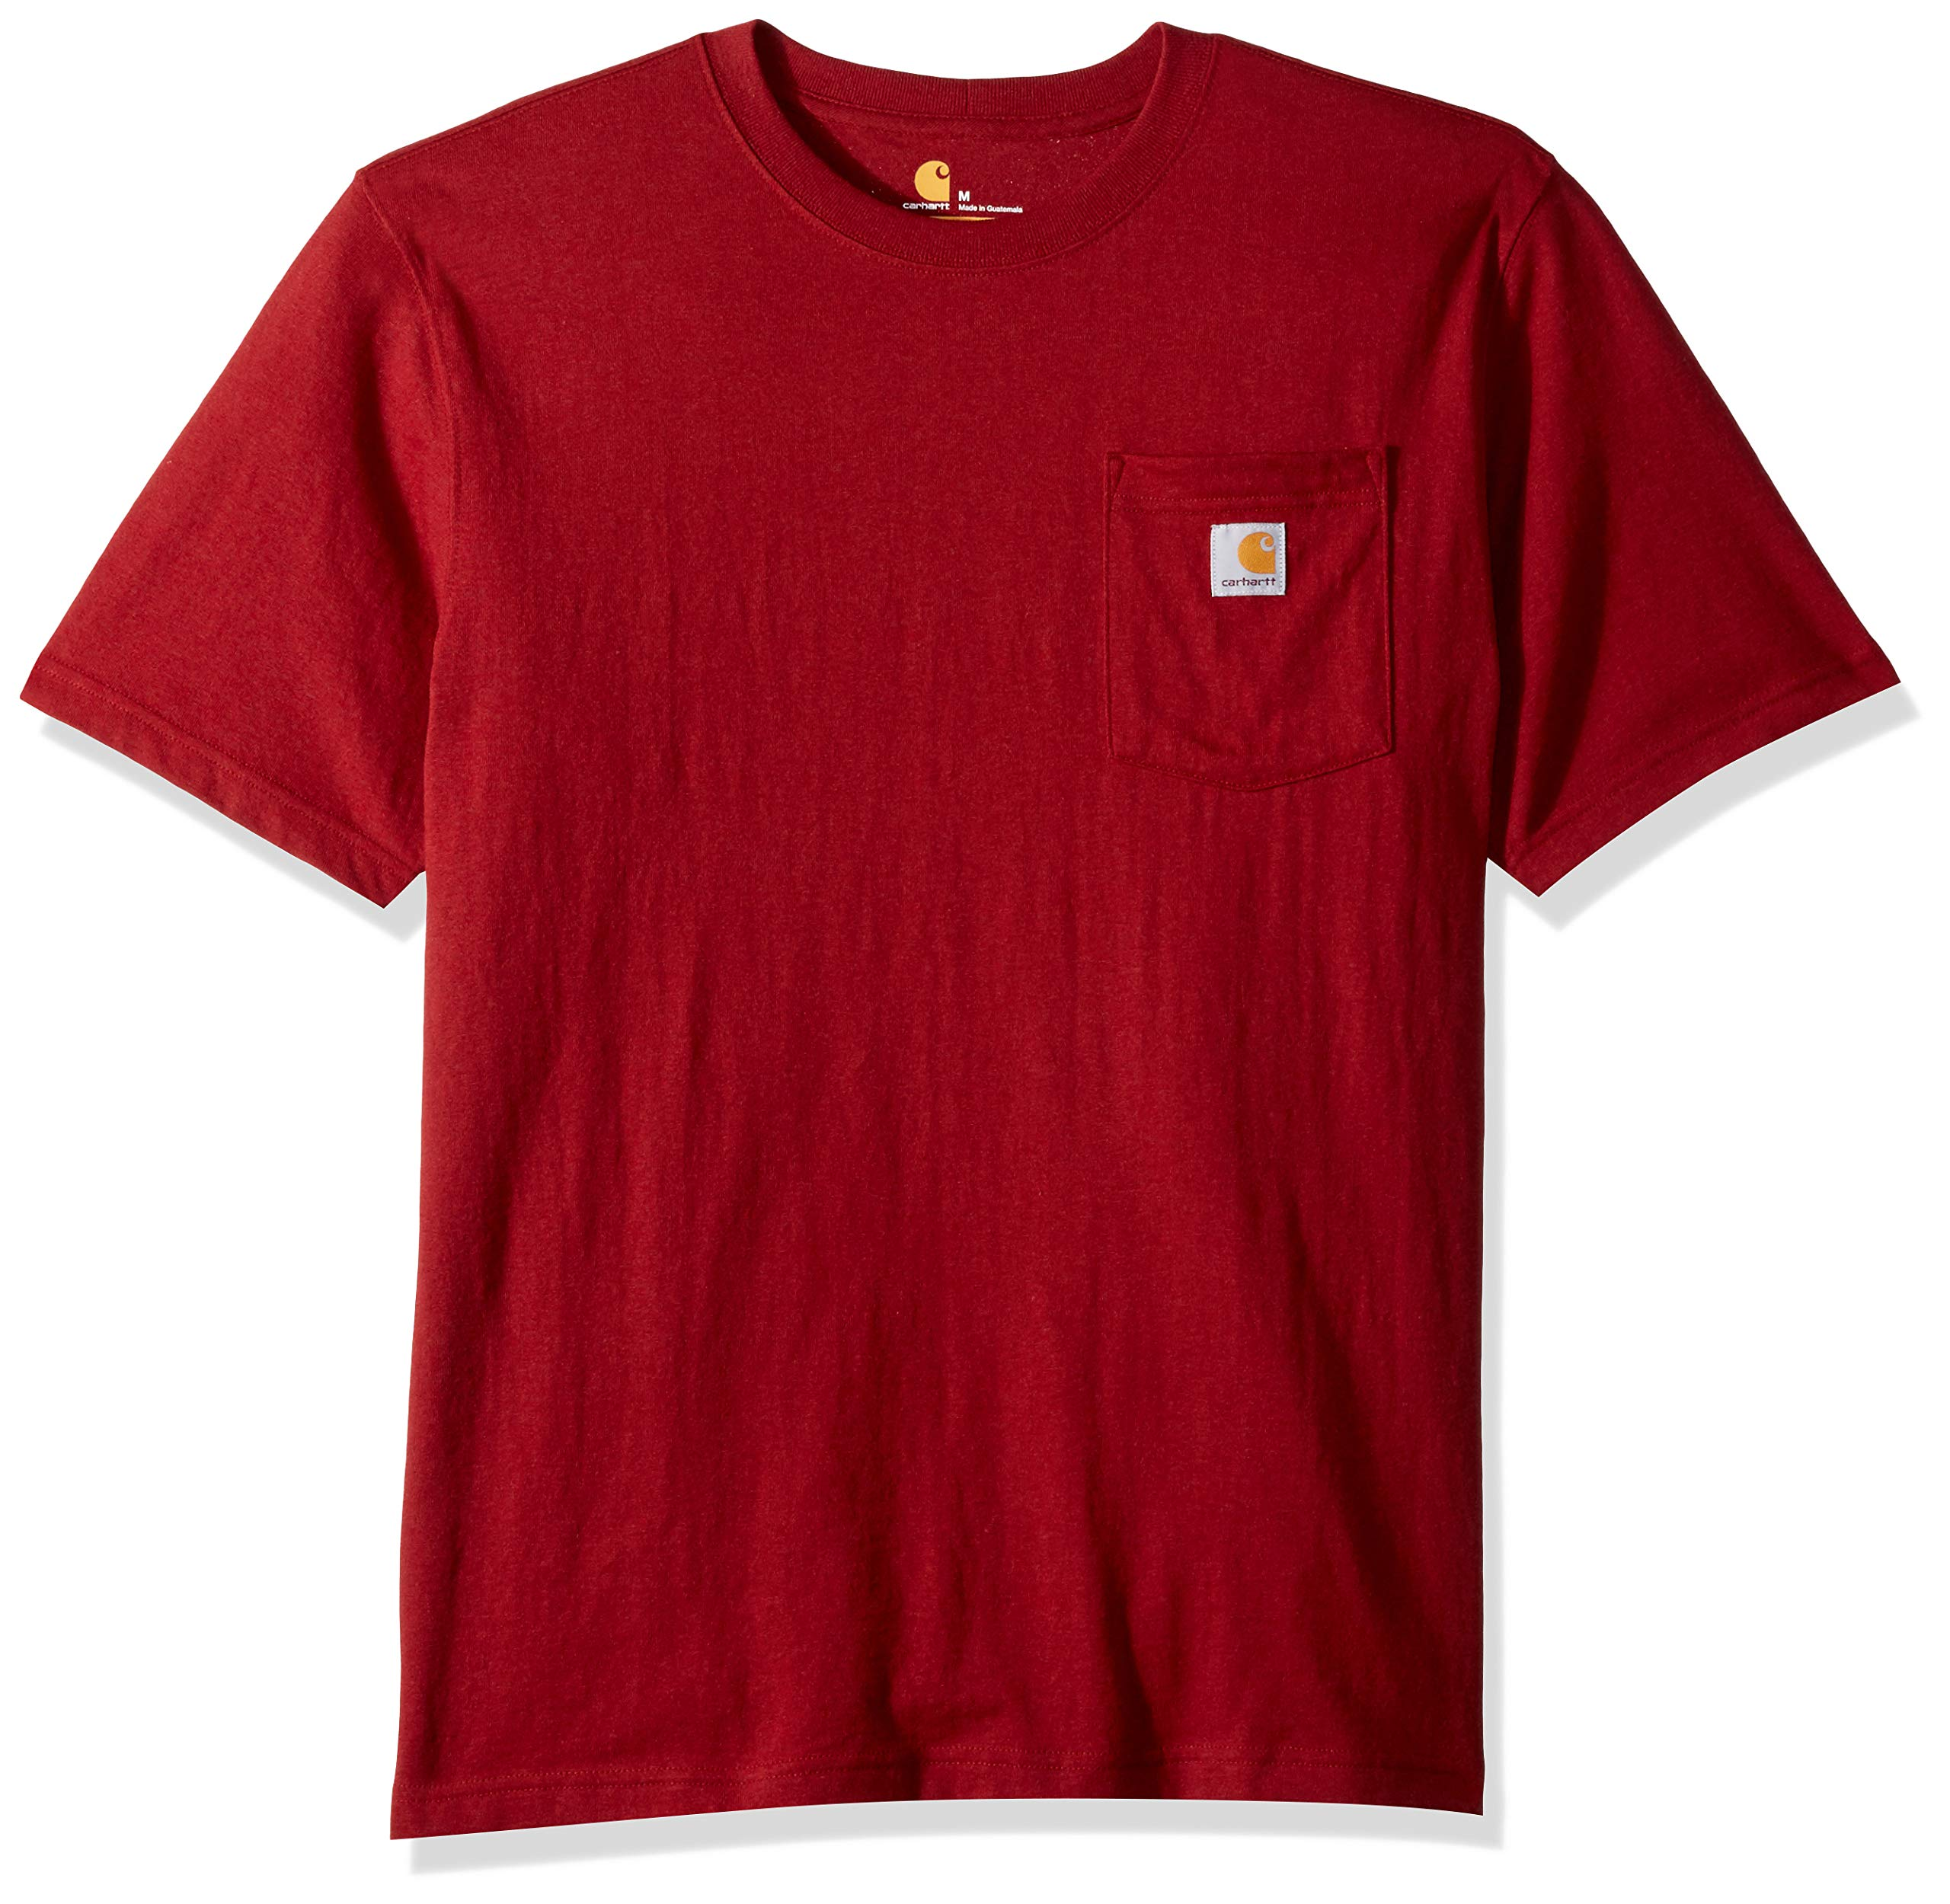 Carhartt Men's K87 Workwear Pocket Short Sleeve T-Shirt (Regular and Big & Tall Sizes), Sun-Dried tomato heather, X-Large by Carhartt